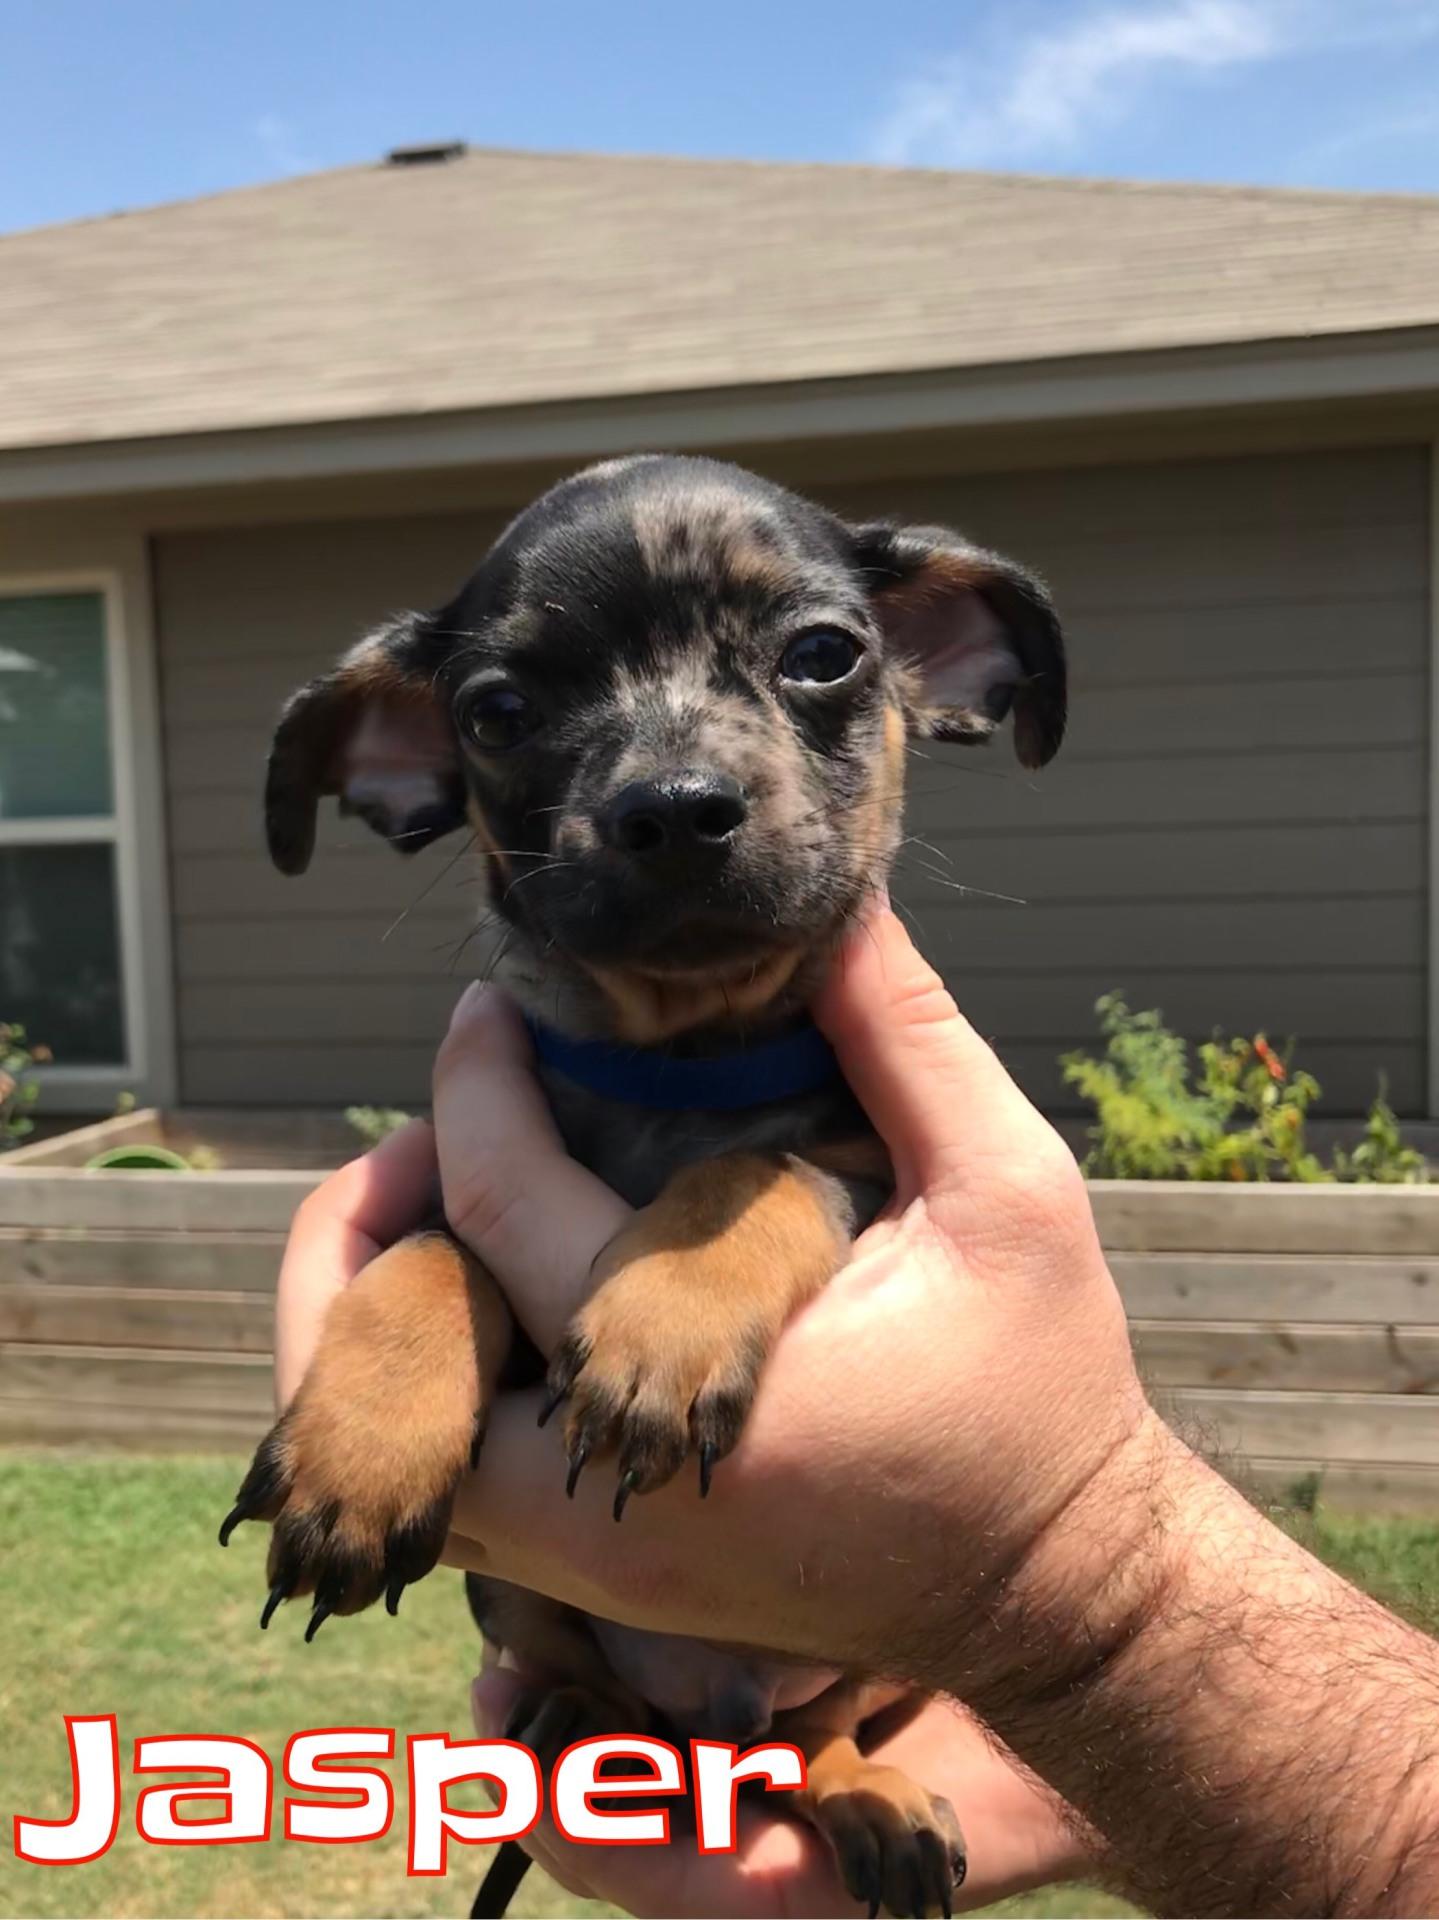 Jasper - Adopted 9/18/2018